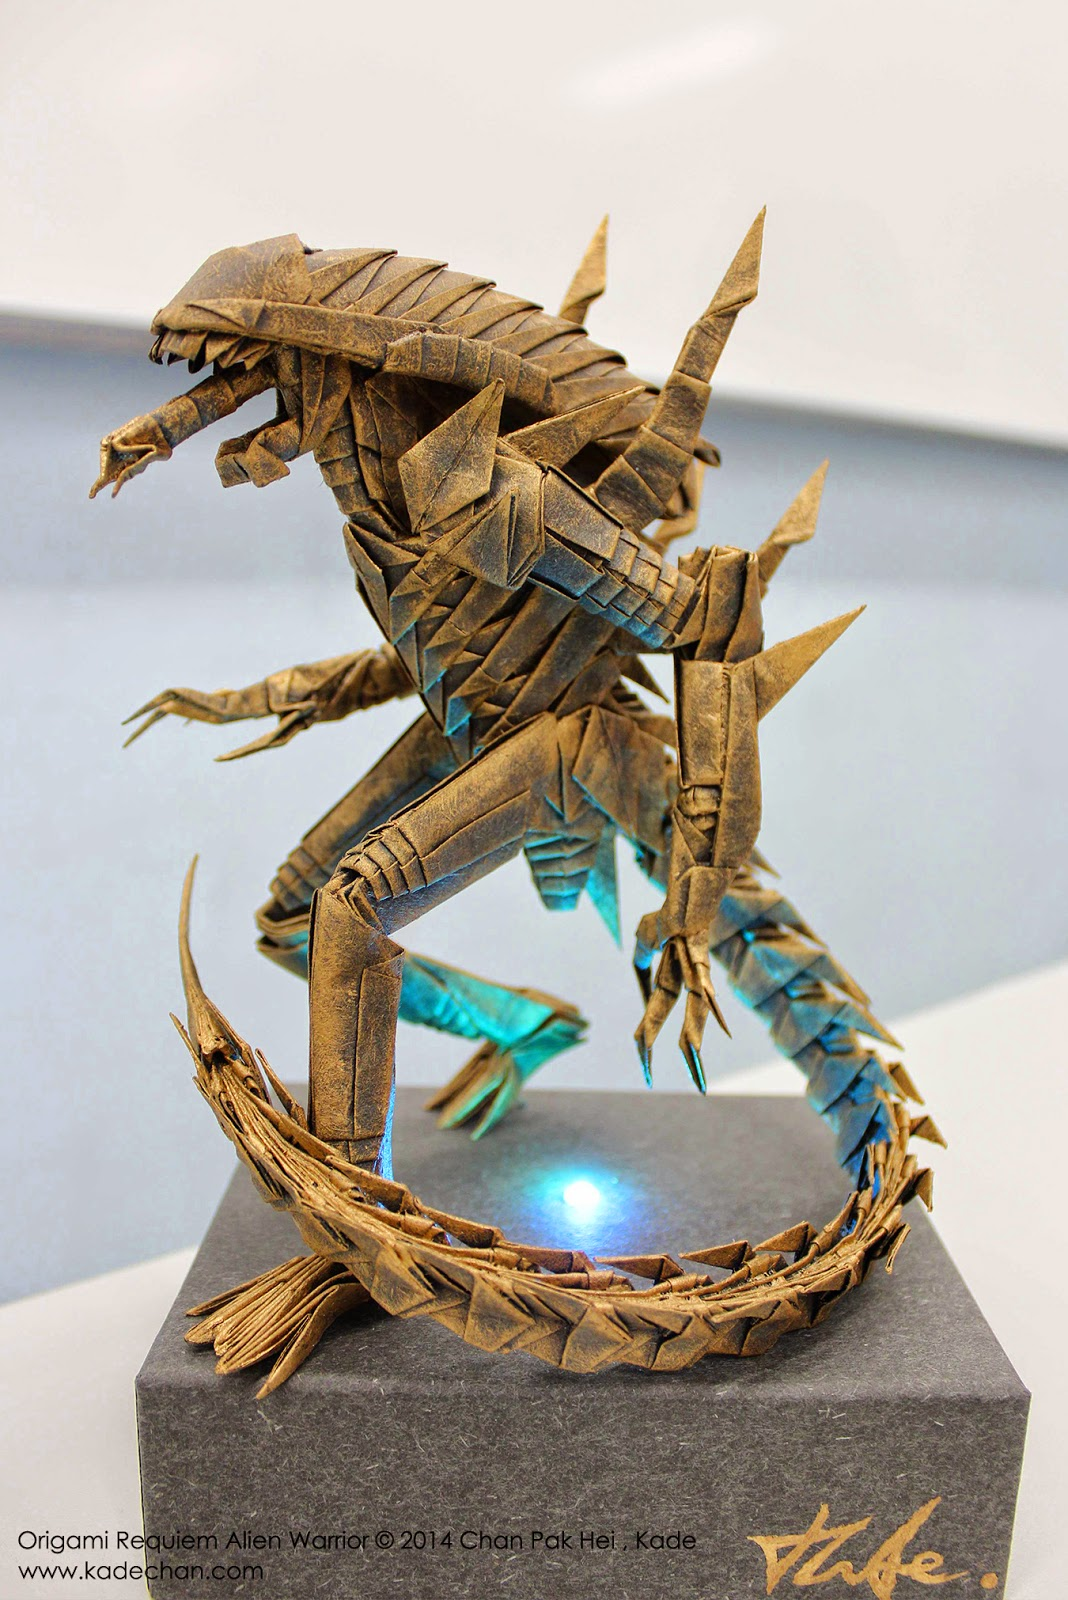 Kade Chan Origami Blog 香港摺紙工作室 日誌 Origami Requiem Alien